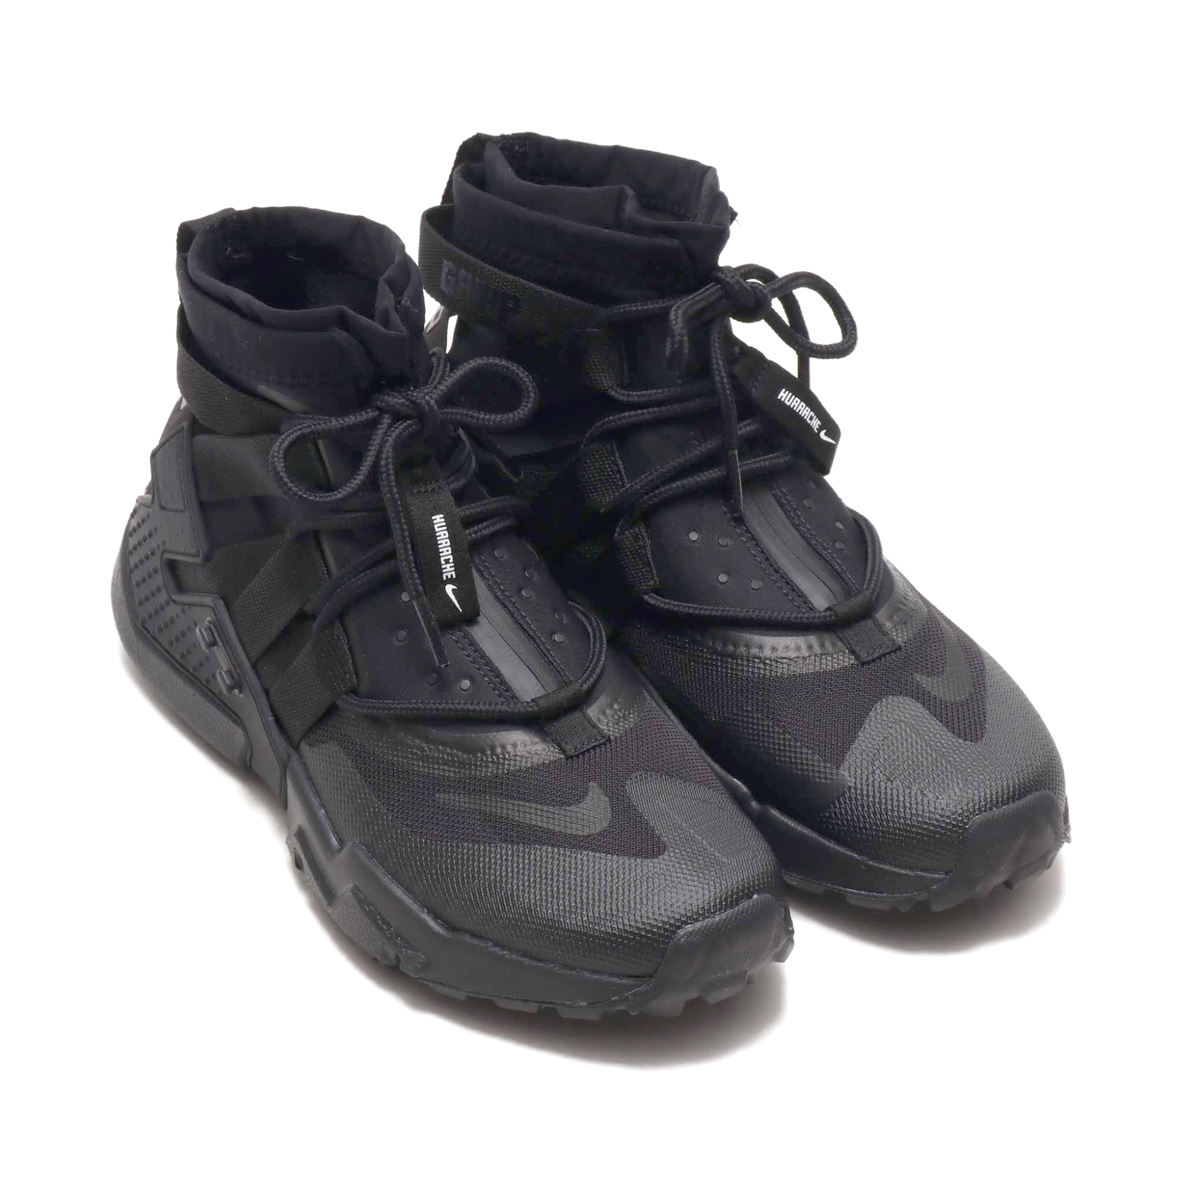 NIKE AIR HUARACHE GRIPP (ナイキ エア ハラチ グリップ)BLACK/BLACK-BLACK-WHITE【メンズ レディース スニーカー】18HO-I